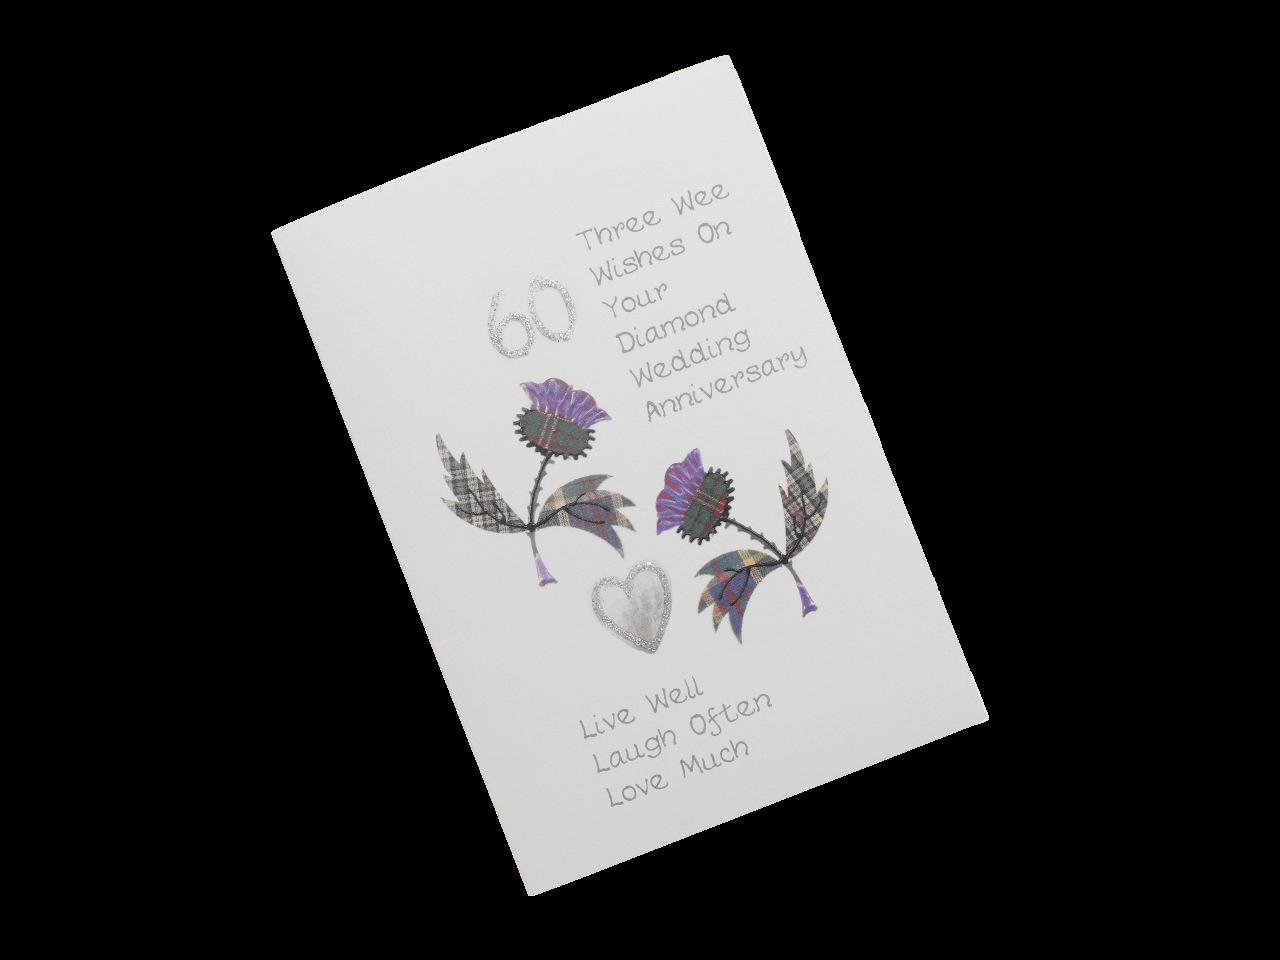 scottish diamond 60th anniversary card tartan thistles scots language